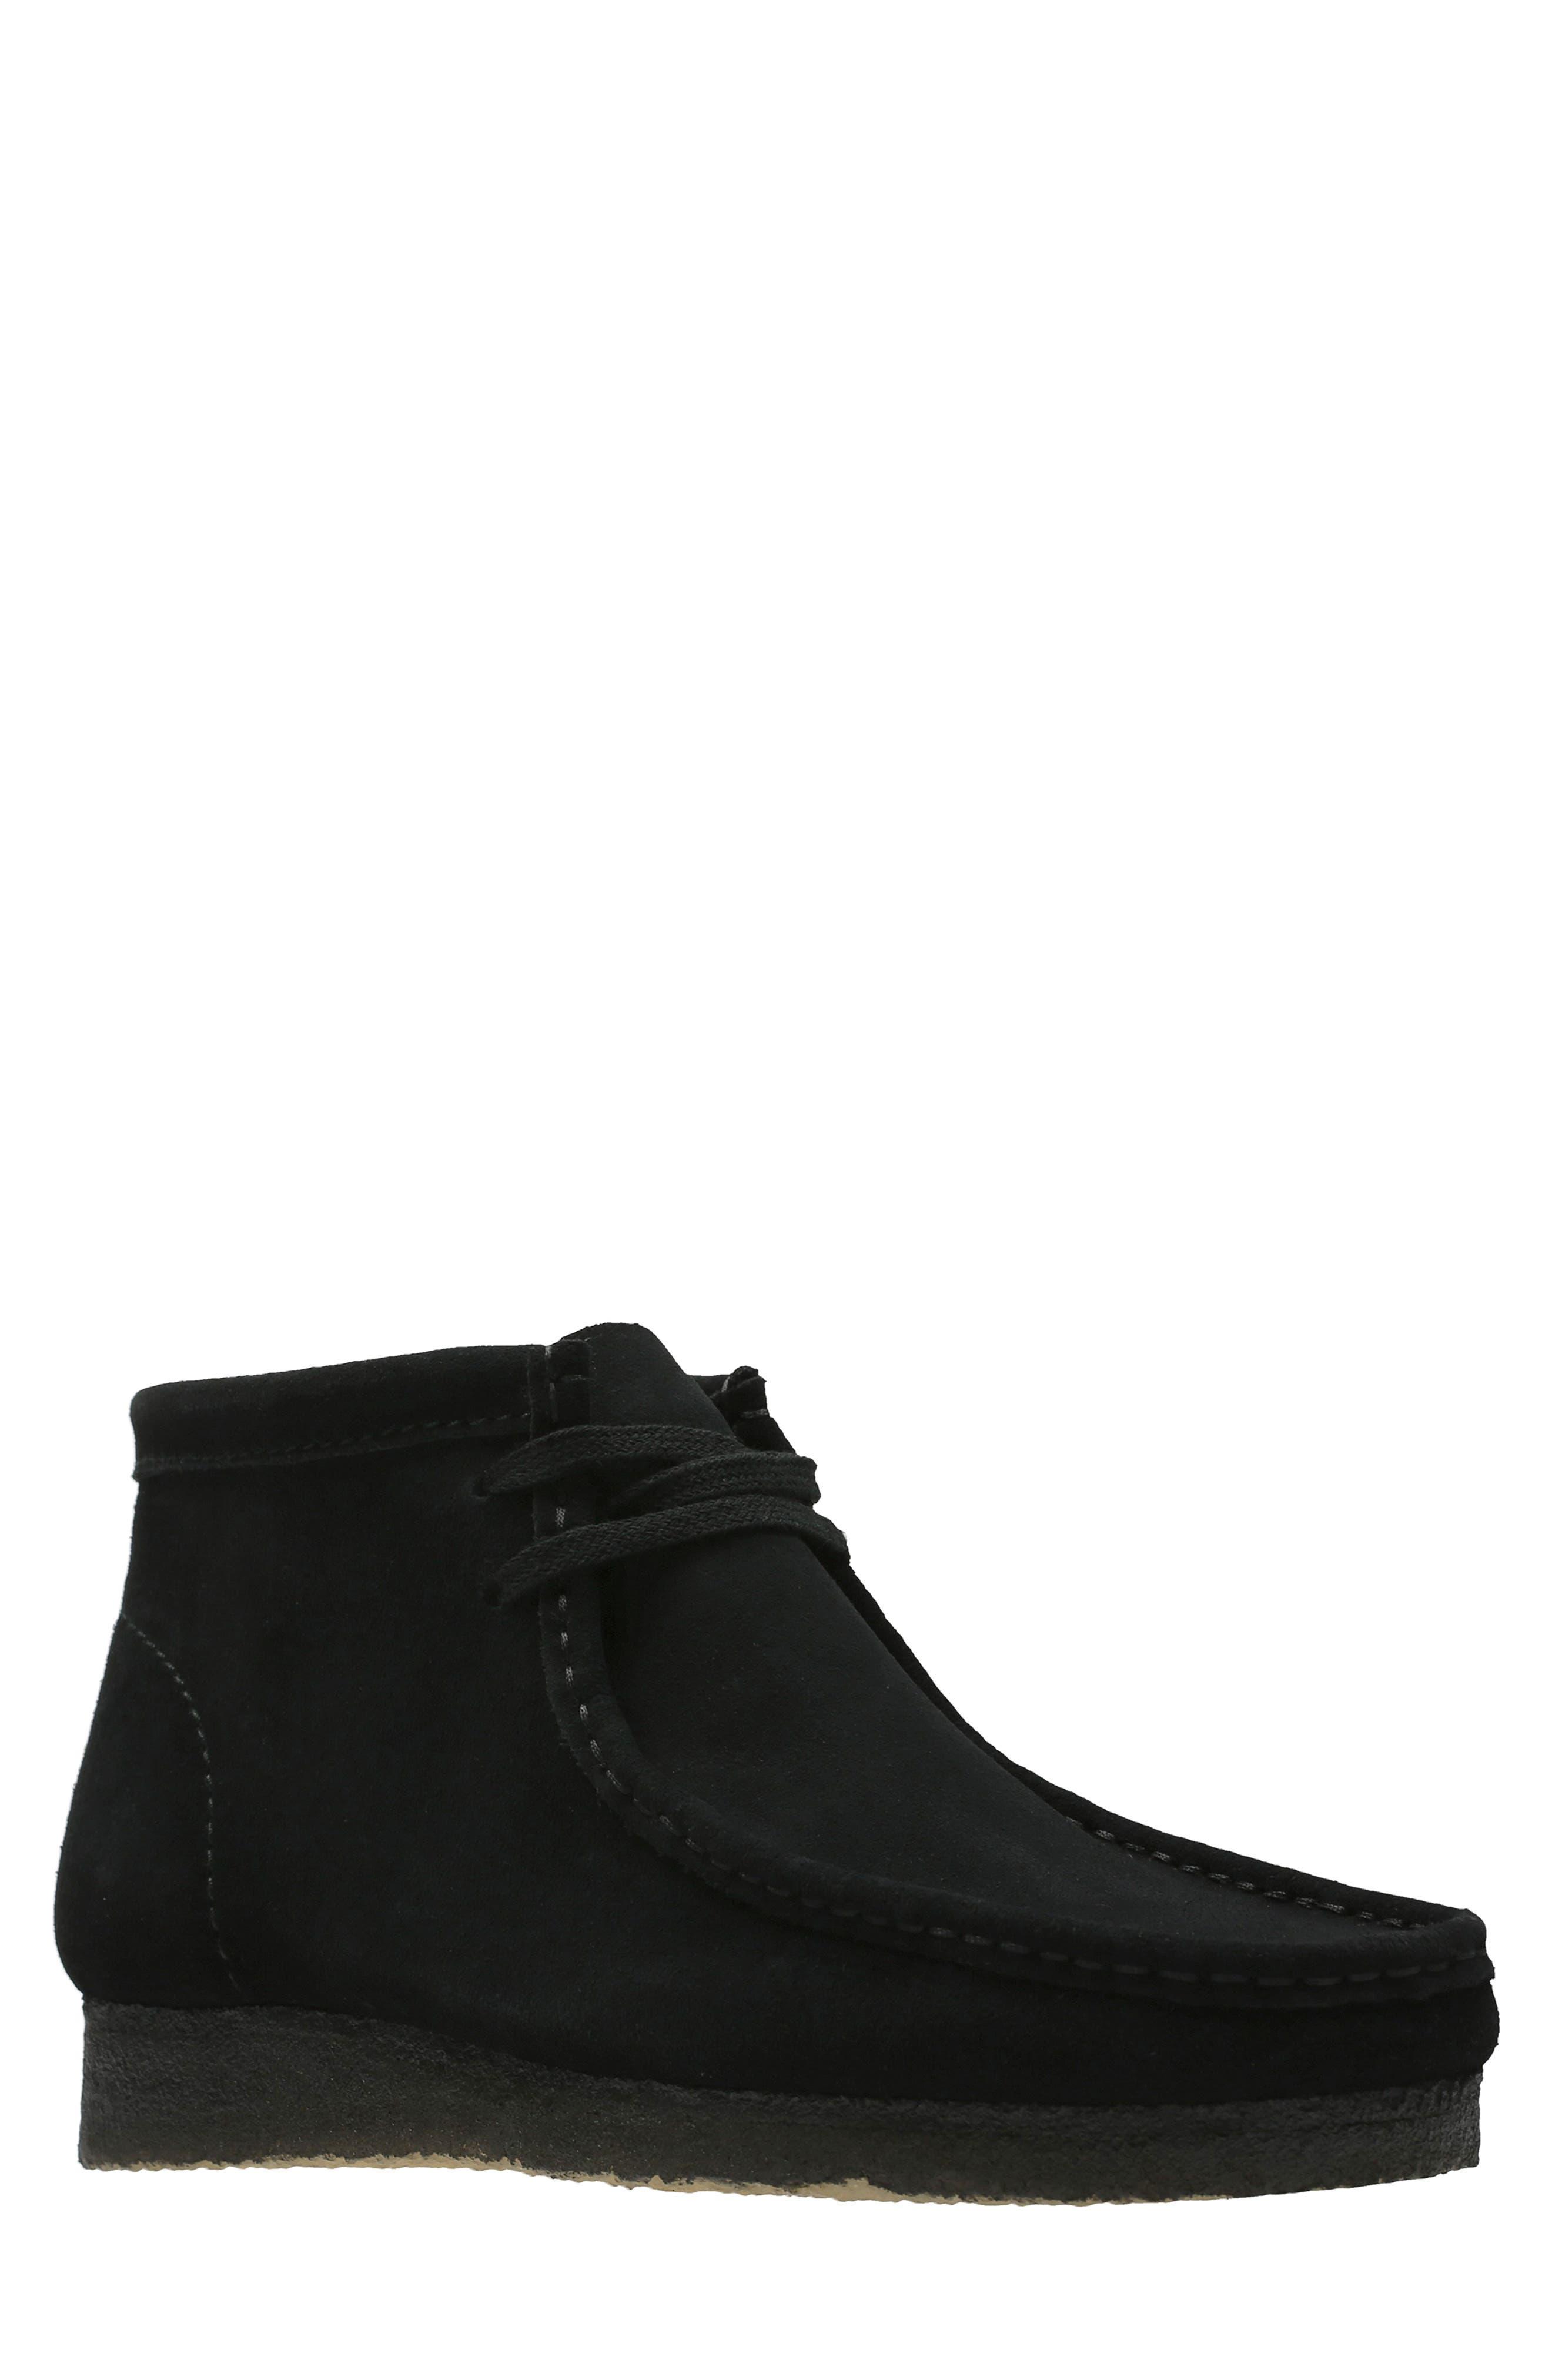 Clarks Originals Wallabee Boot- Black